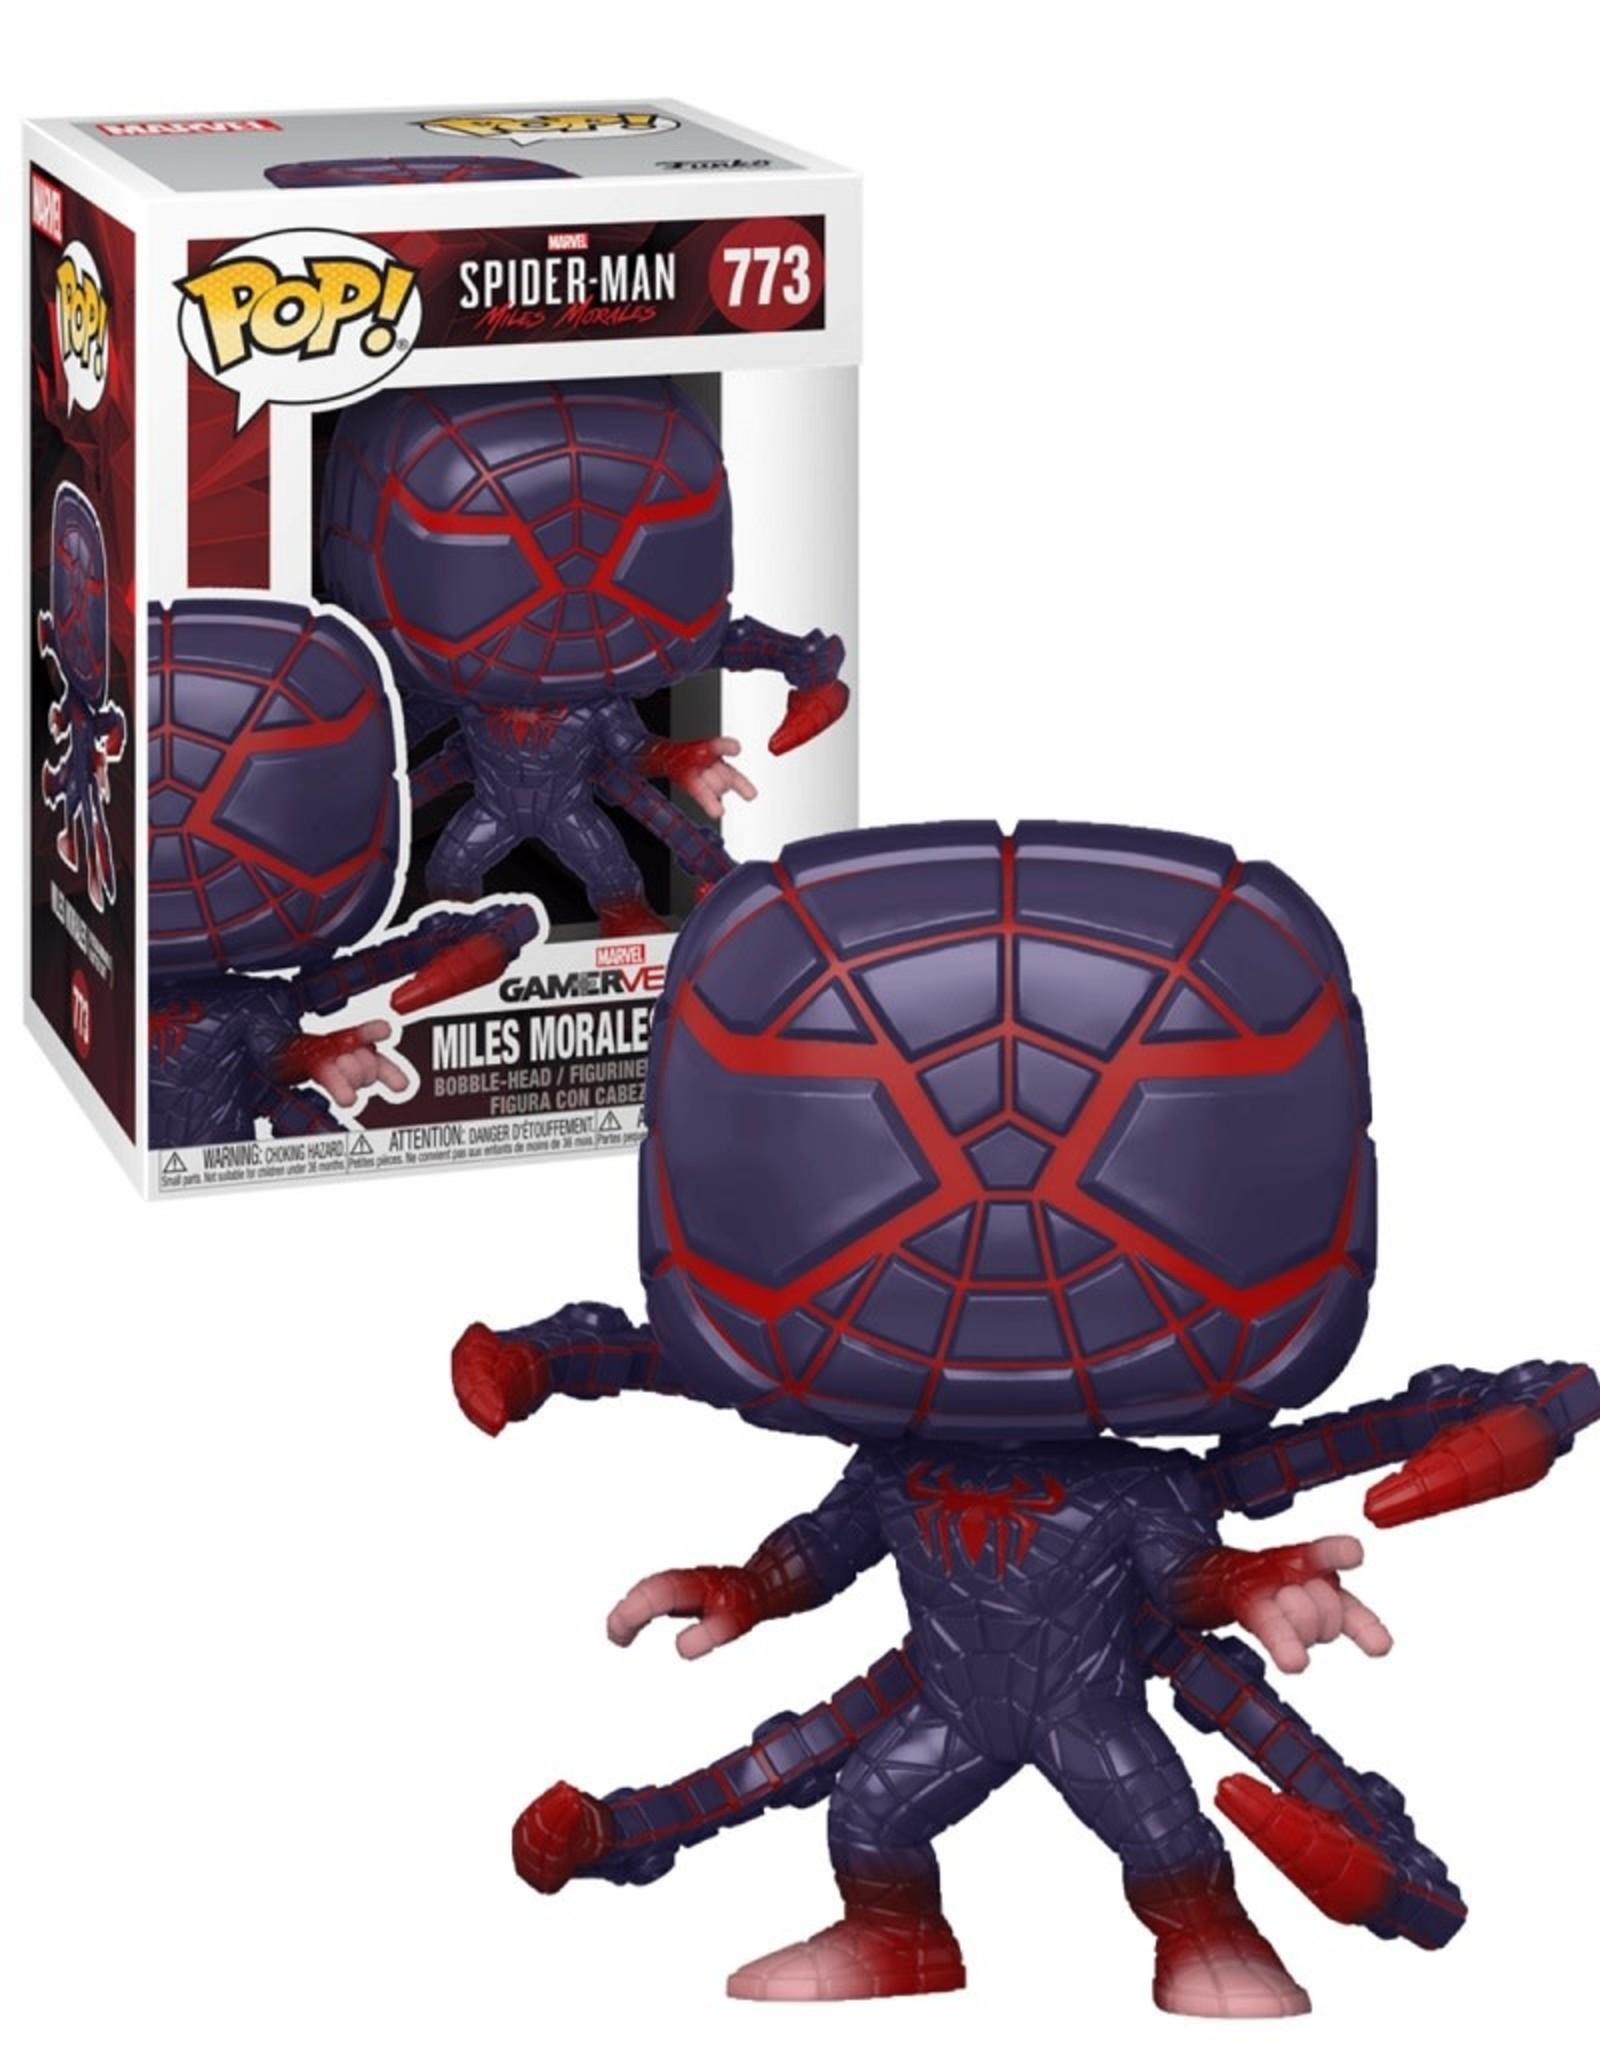 Spider-Man 773 ( Funko Pop ) Miles Morales